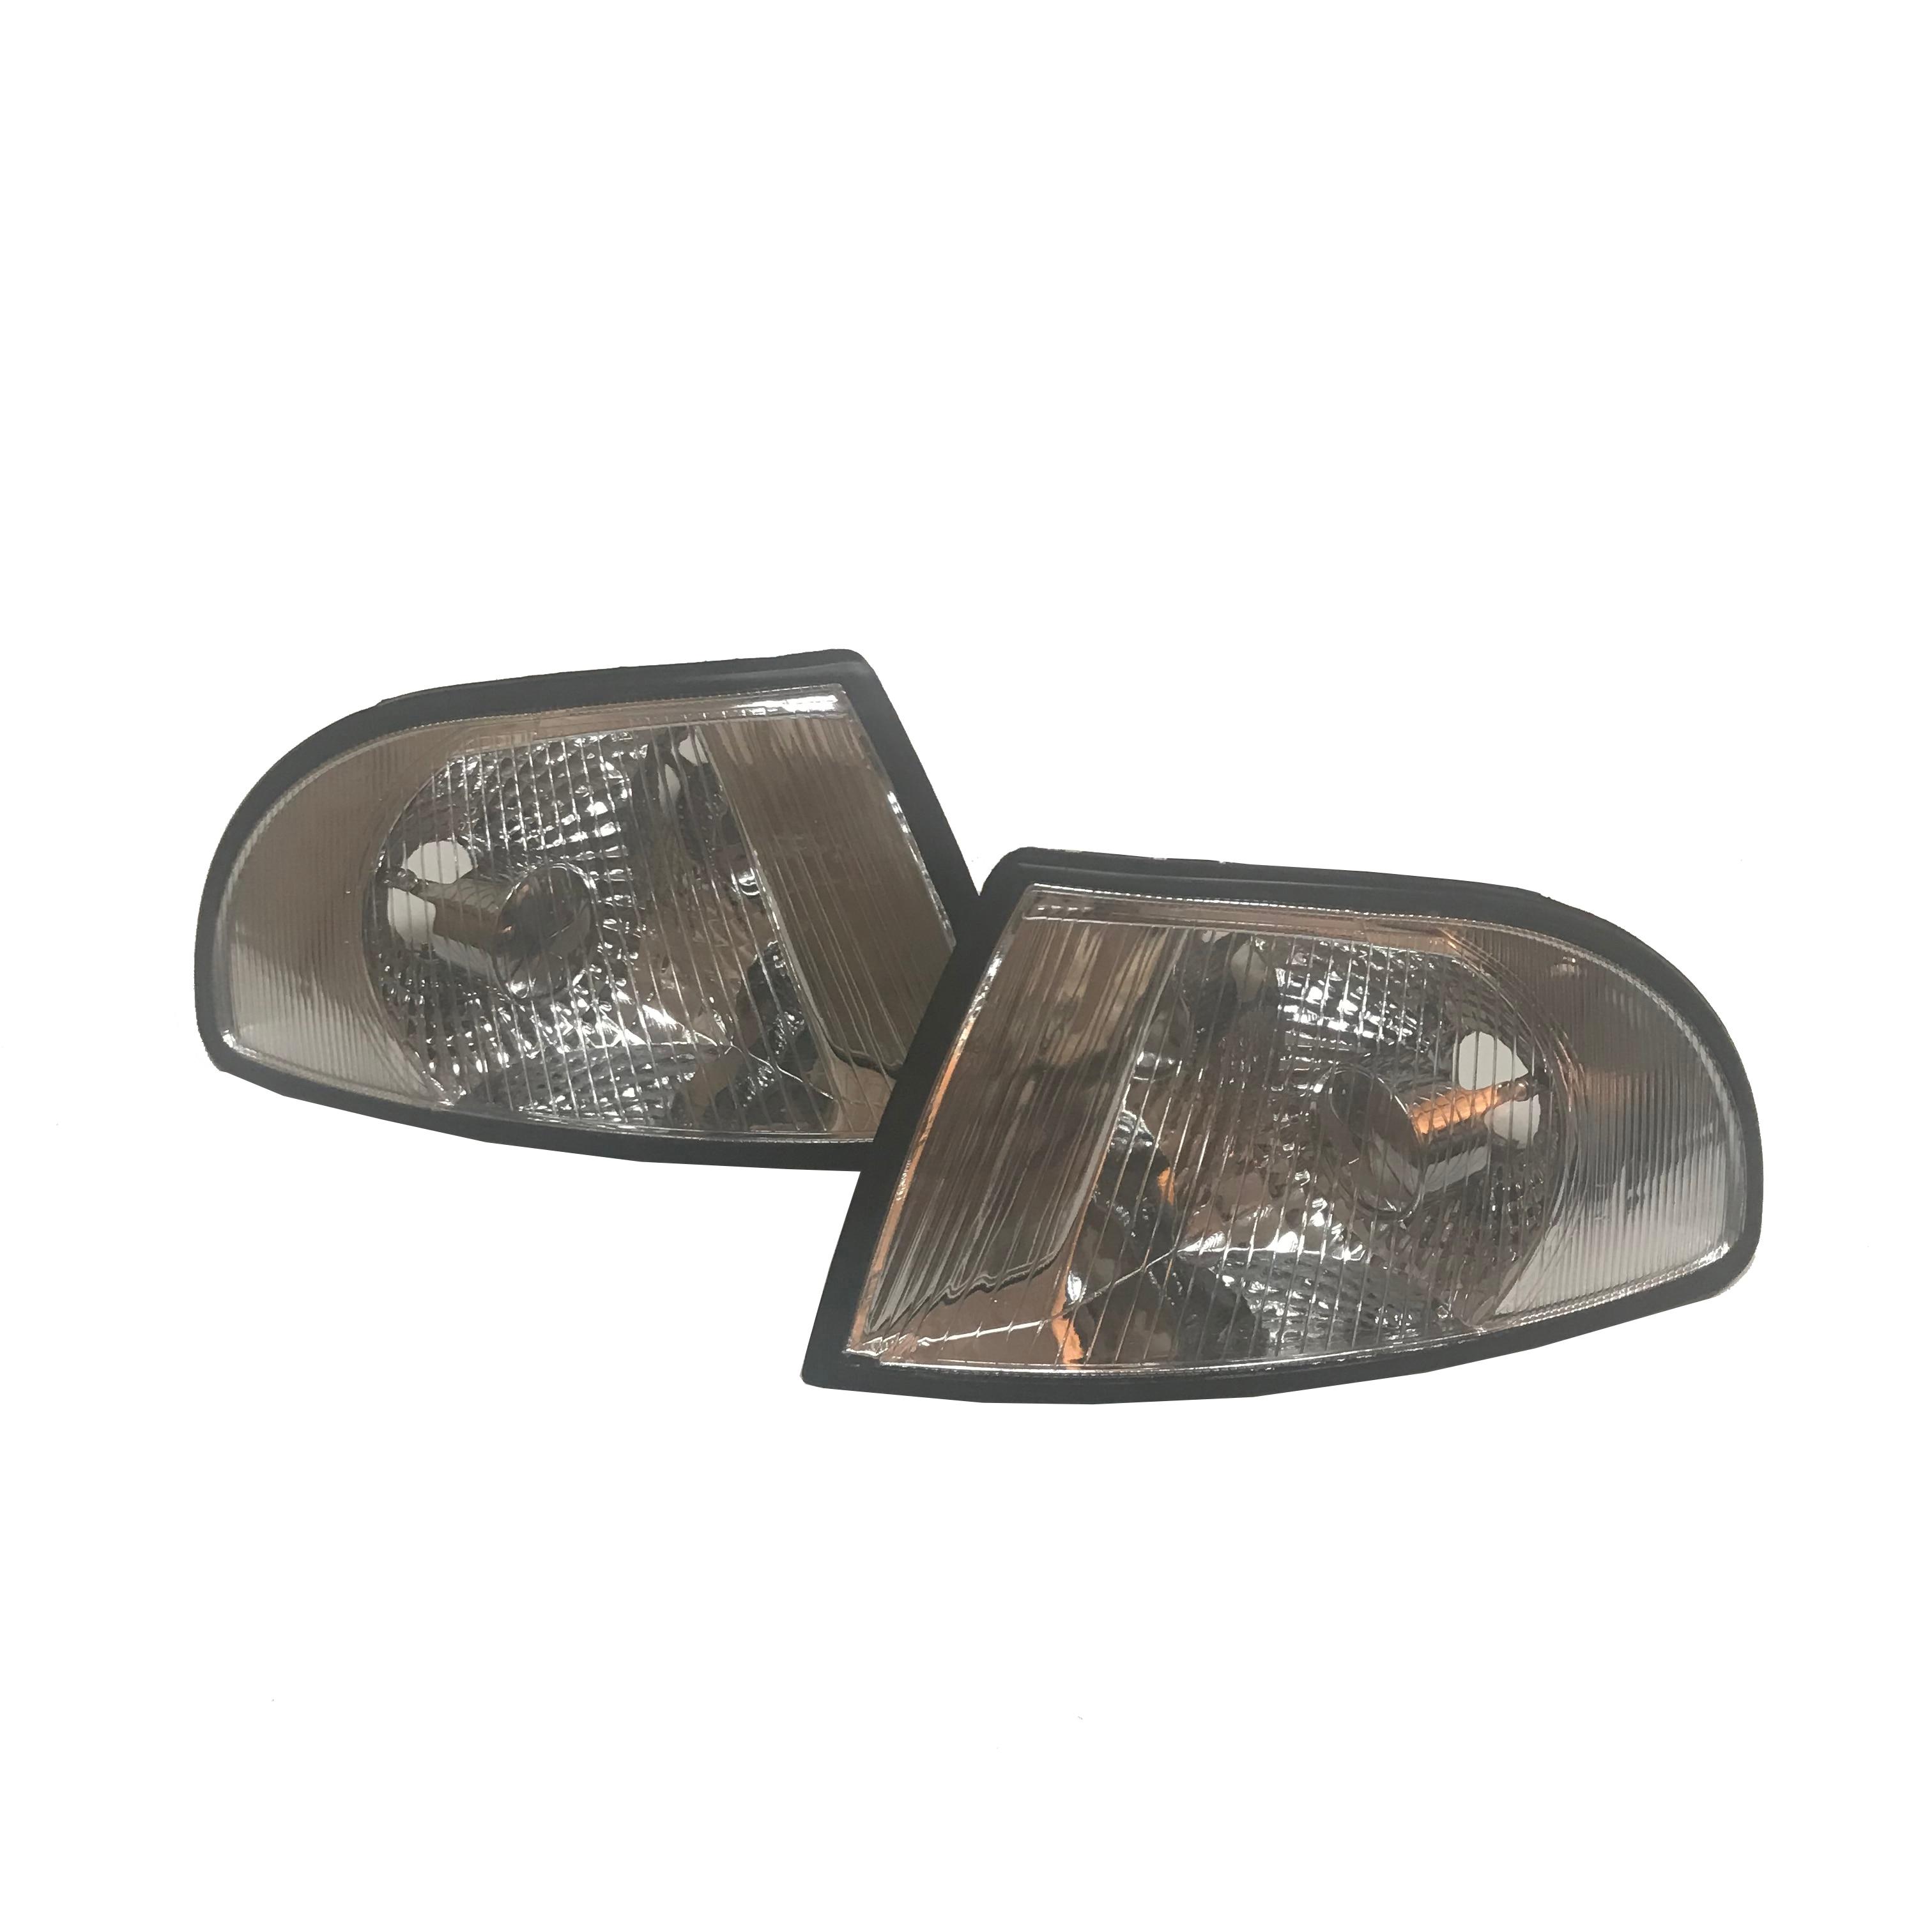 1 Pair Clear Lens Corner Lamp  For Audi A4 B5 S4 Front Corner Turn Signal Light Lamp 1994 1995 1996 1997 1998